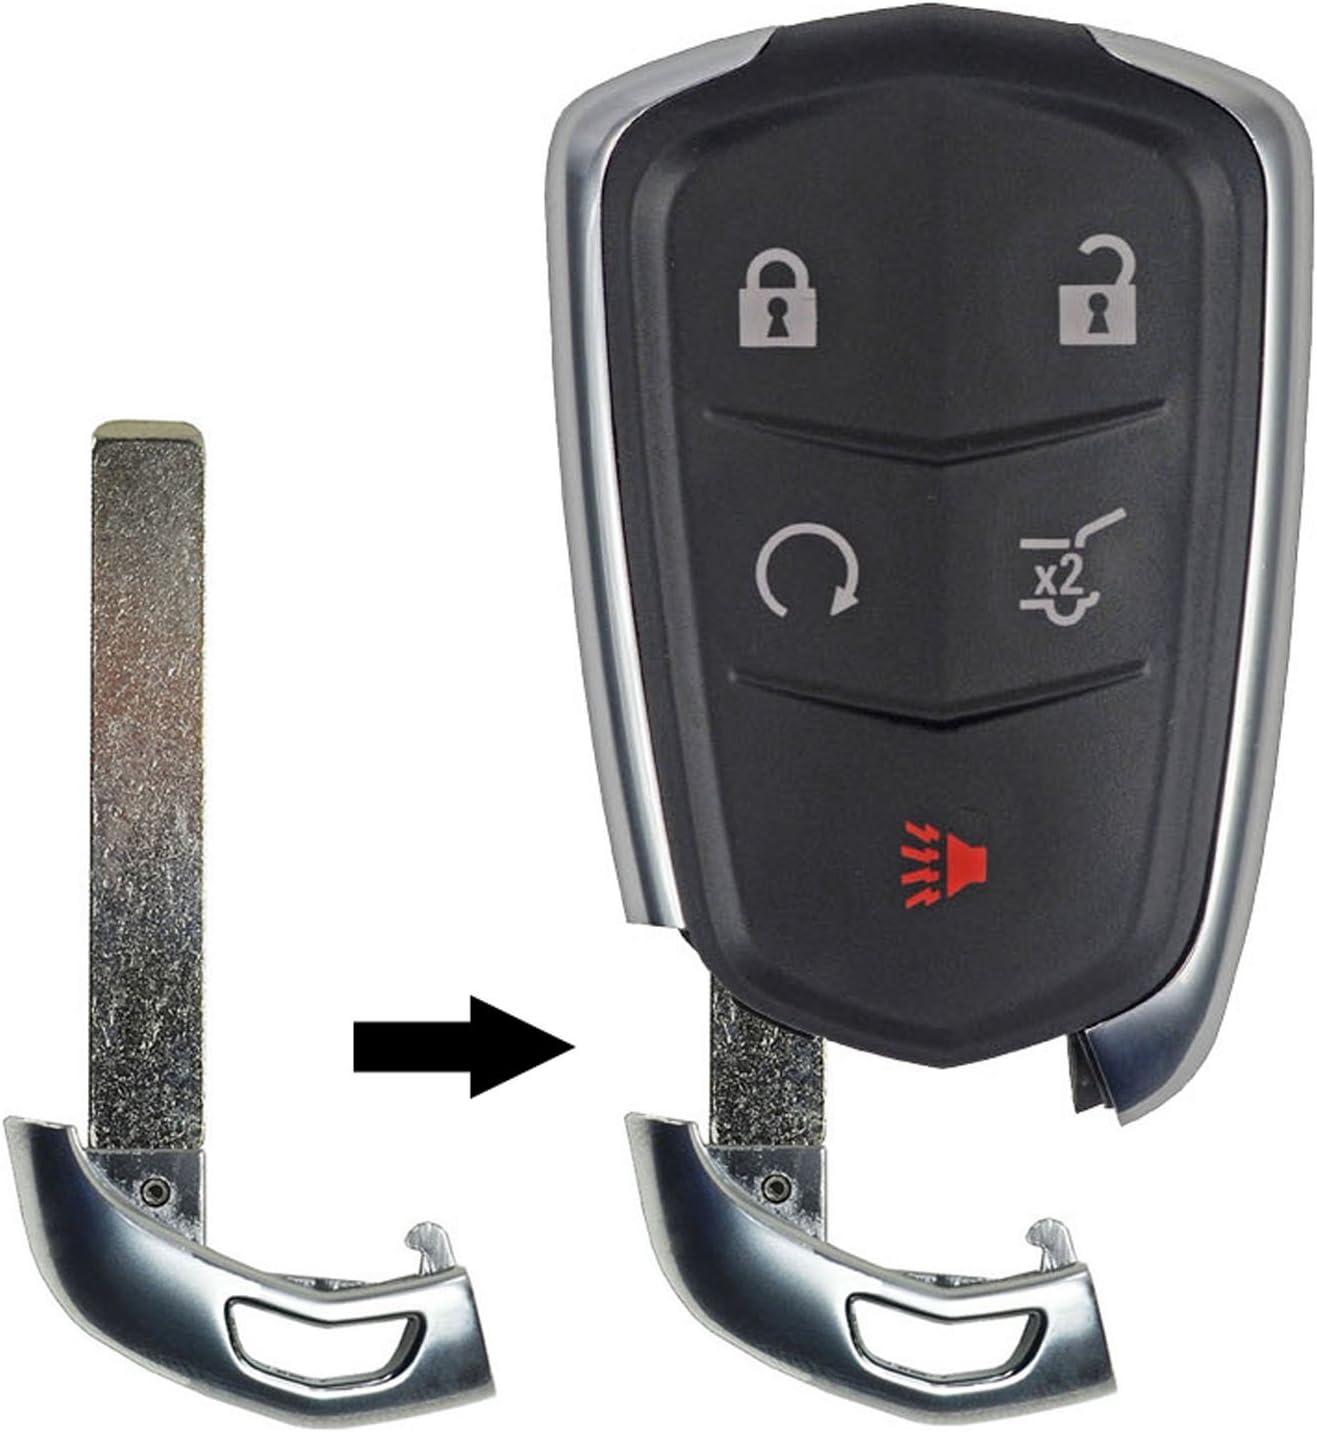 qualitykeylessplus Emergency Key Insert for Cadillac Smart Remote Uncut Blade Blank with Free KEYTAG